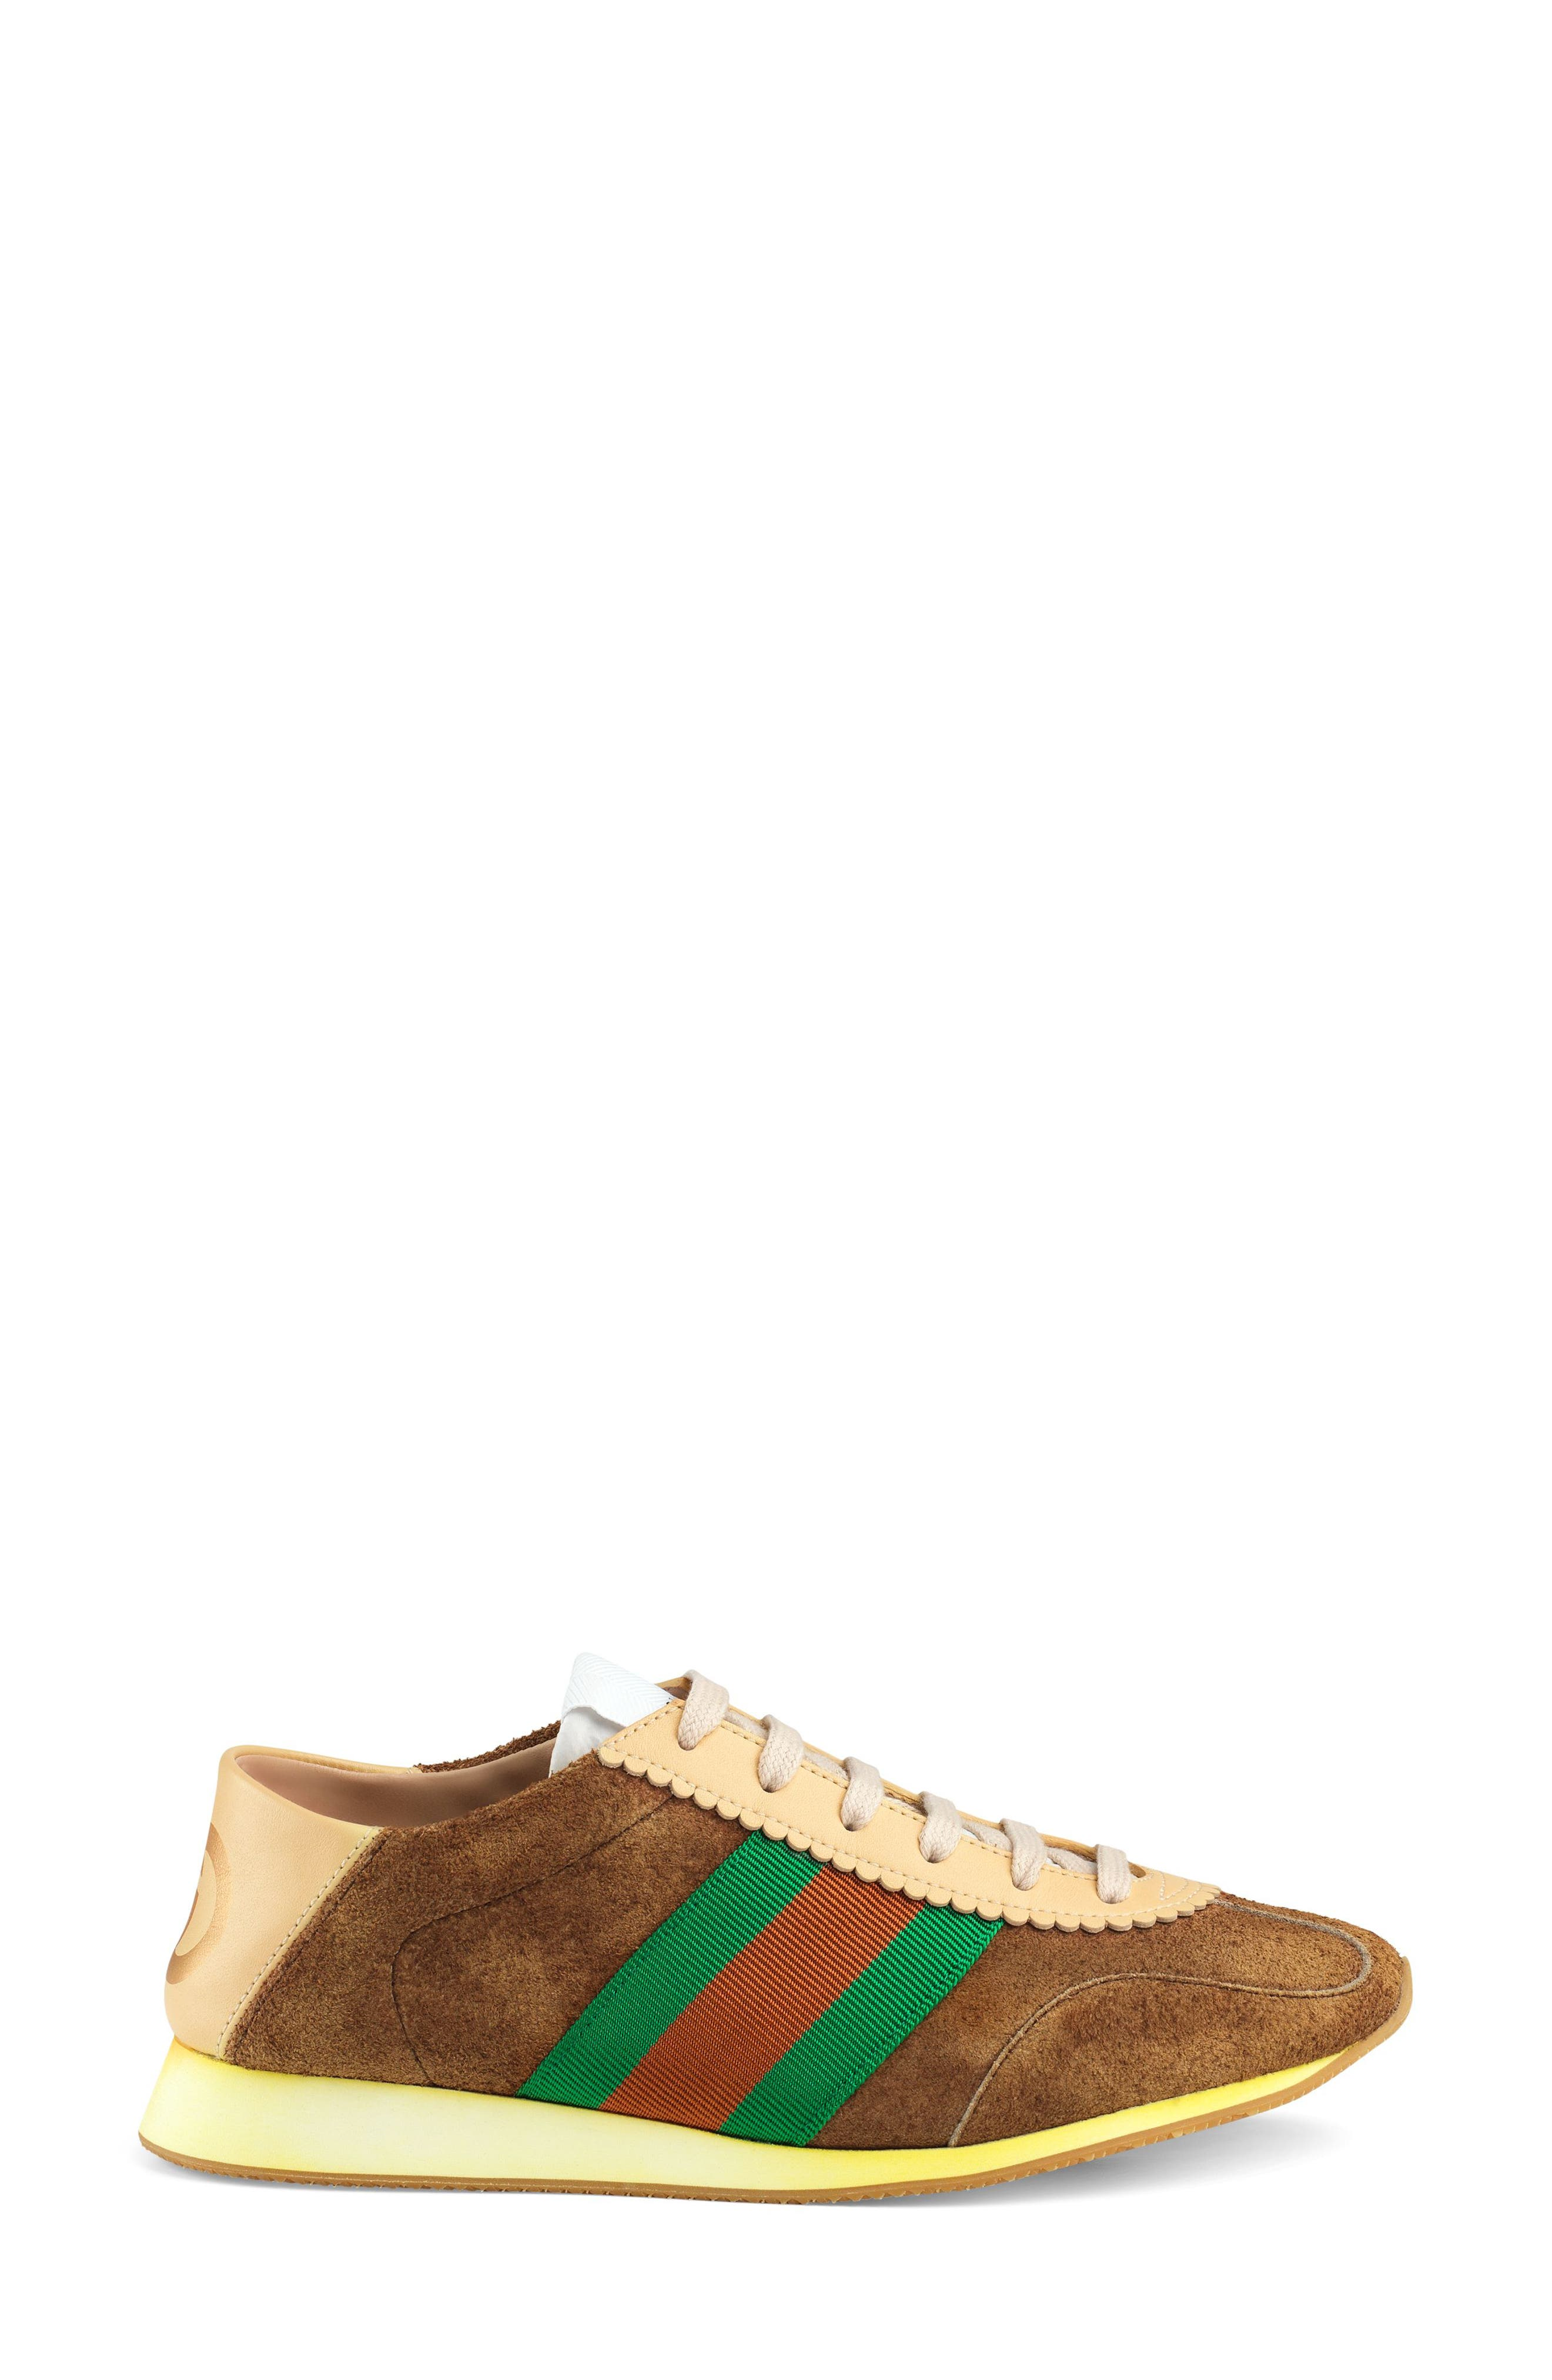 Rocket Convertible Sneaker,                             Alternate thumbnail 2, color,                             BROWN